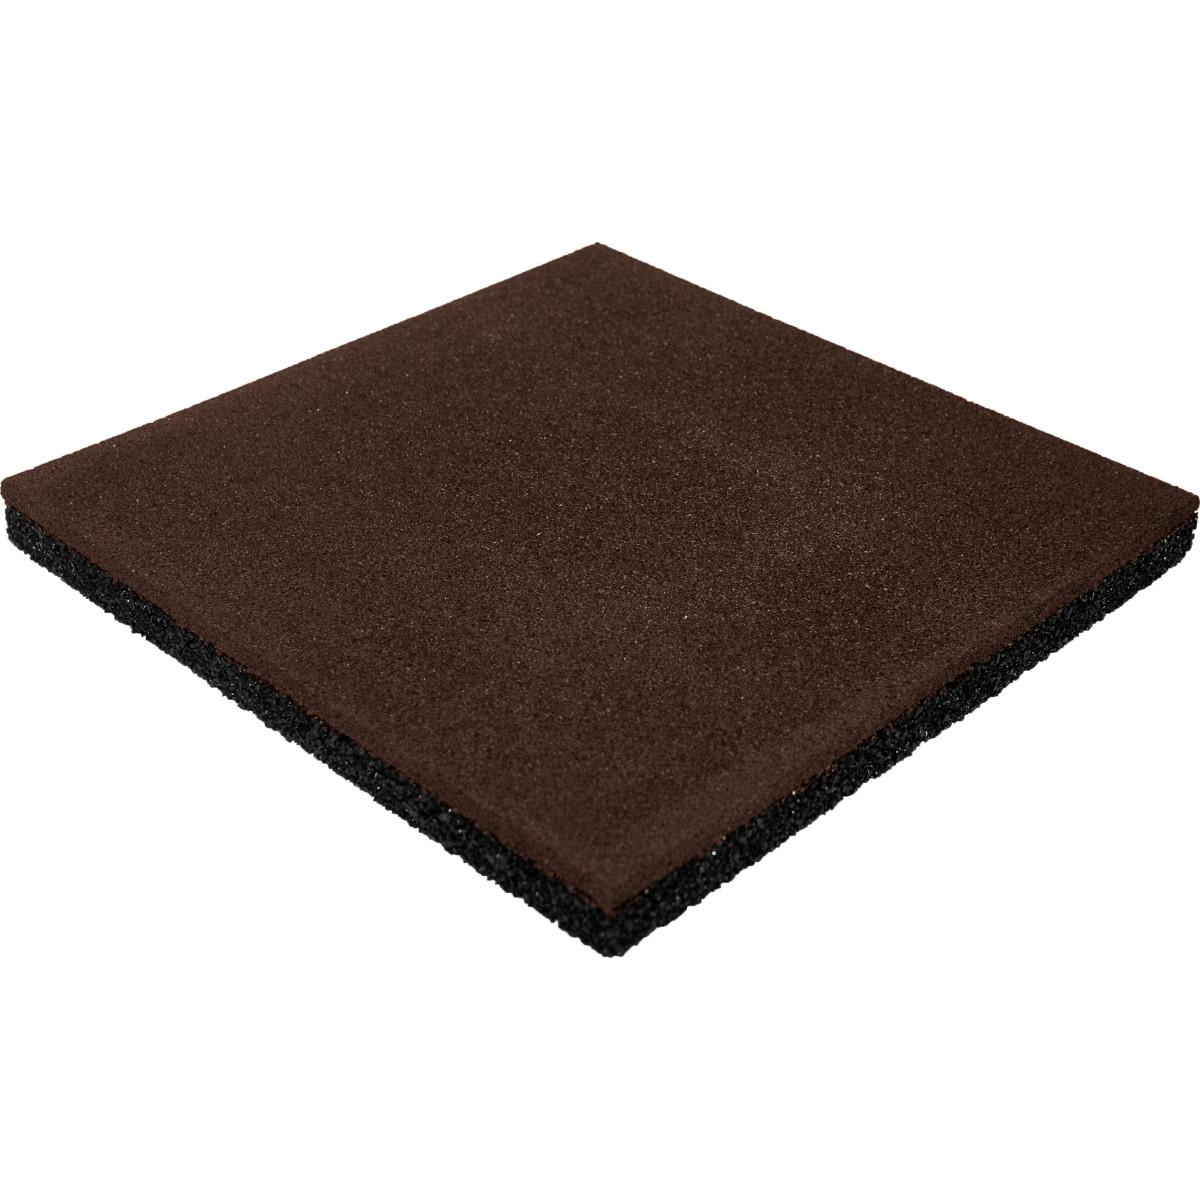 Плитка резиновая 500х500х40 коричневая